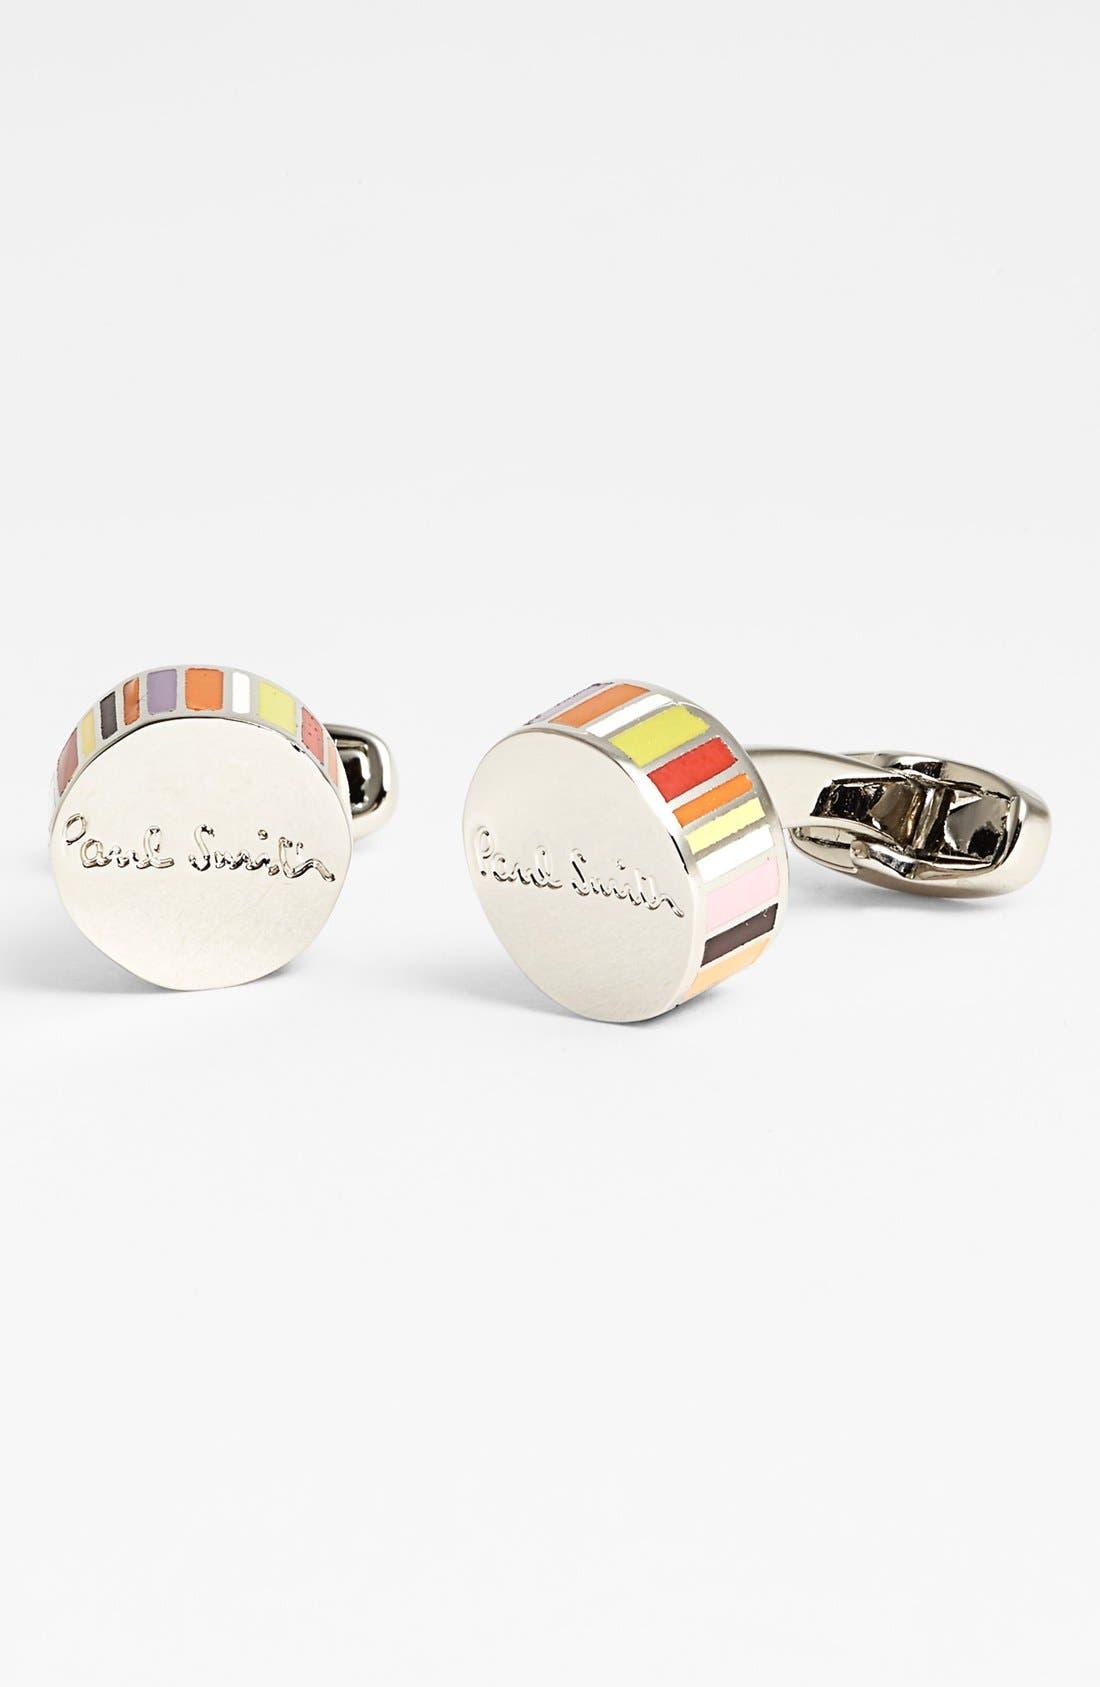 Main Image - Paul Smith Accessories Multi Stripe Round Cuff Links